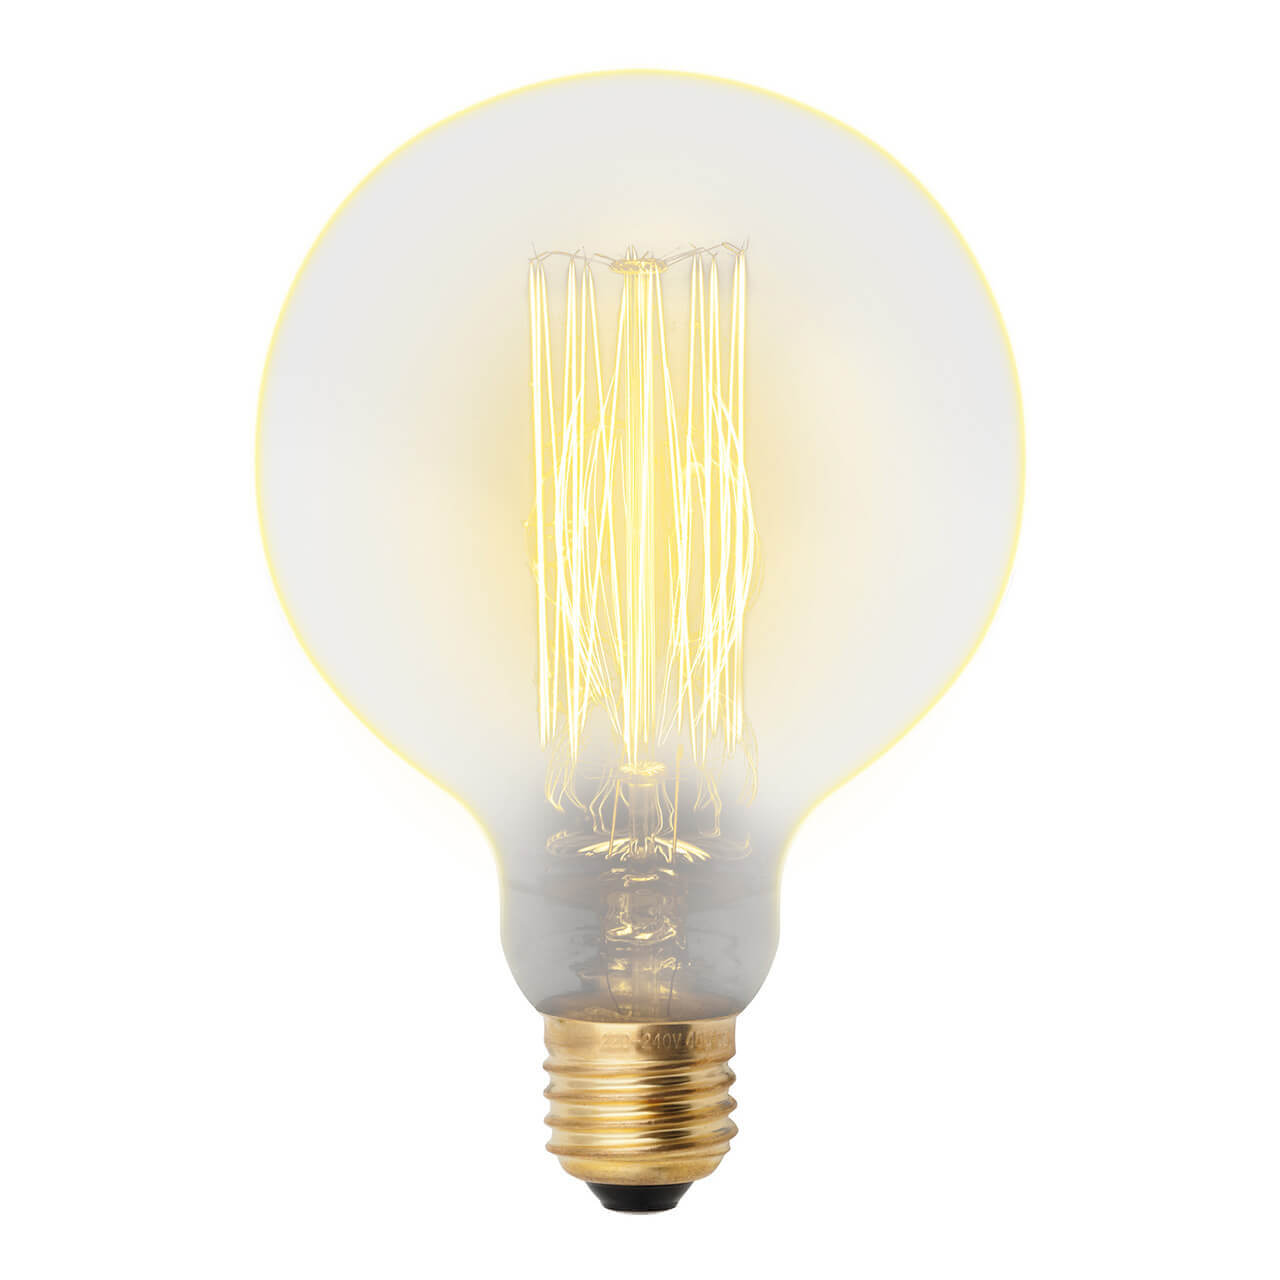 Лампочка Uniel IL-V-G125-60/GOLDEN/E27 VW01 Vintage